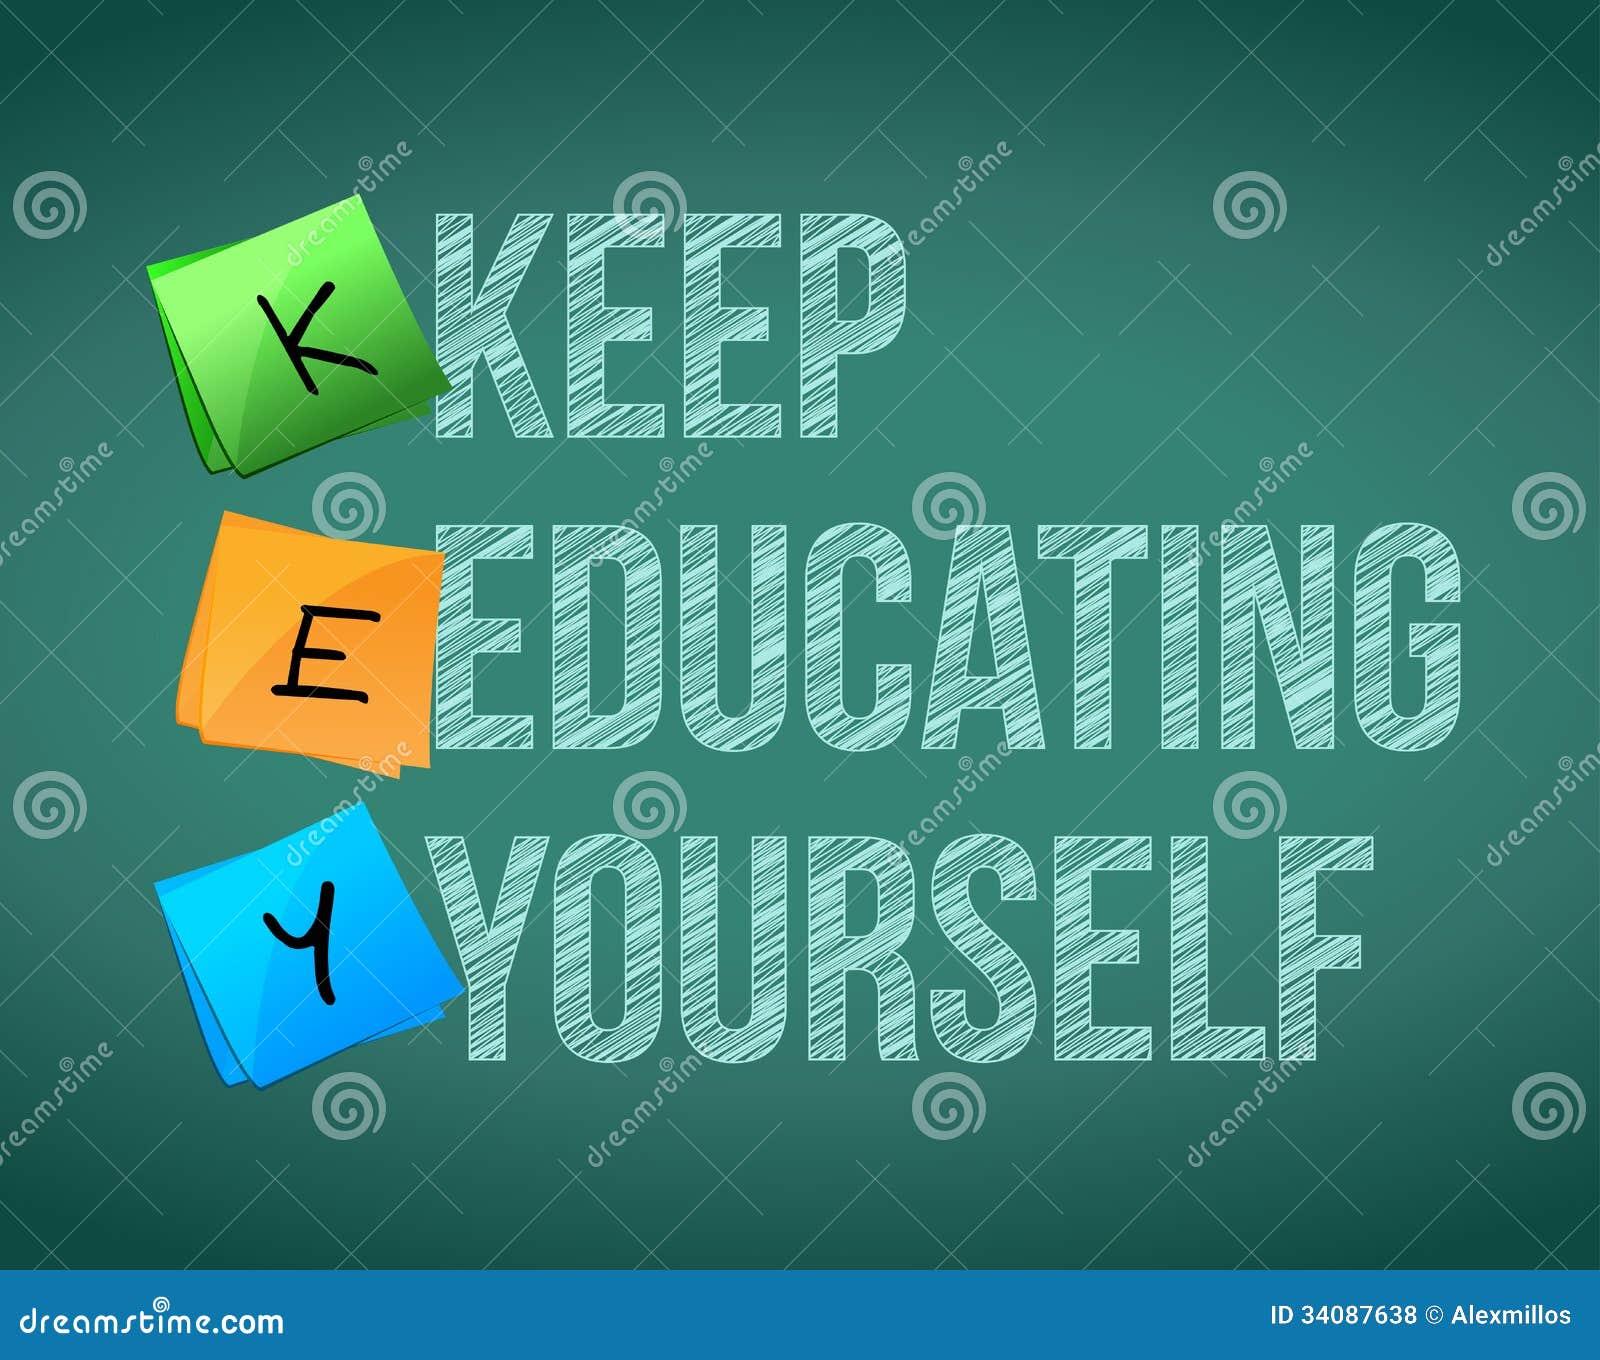 Keep education yourself illustration design